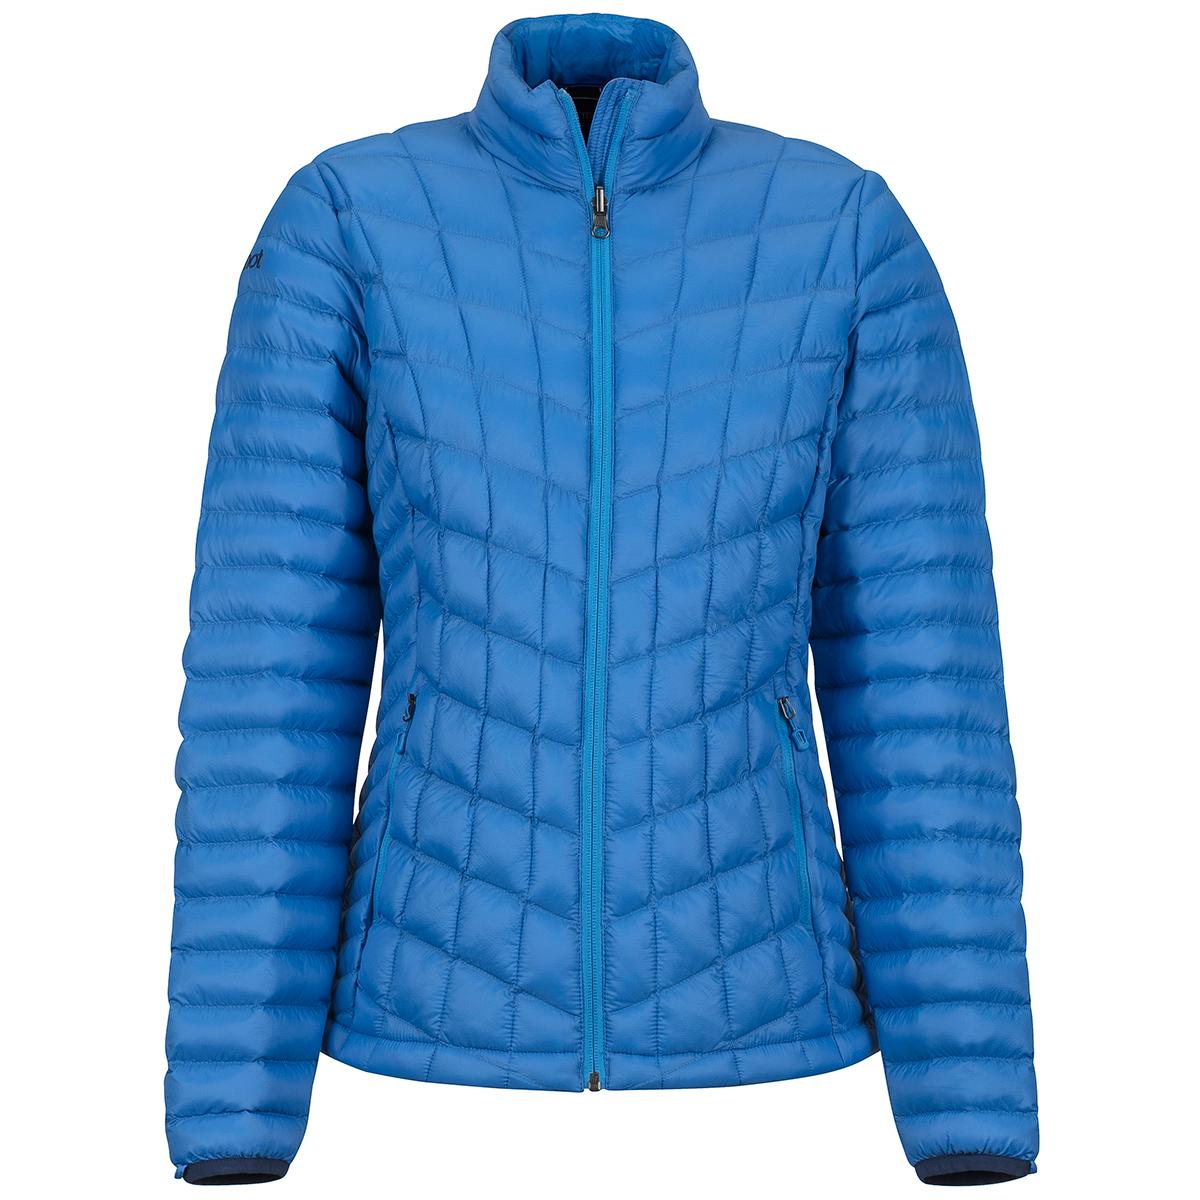 Marmot Women's Featherless Jacket - Blue, M